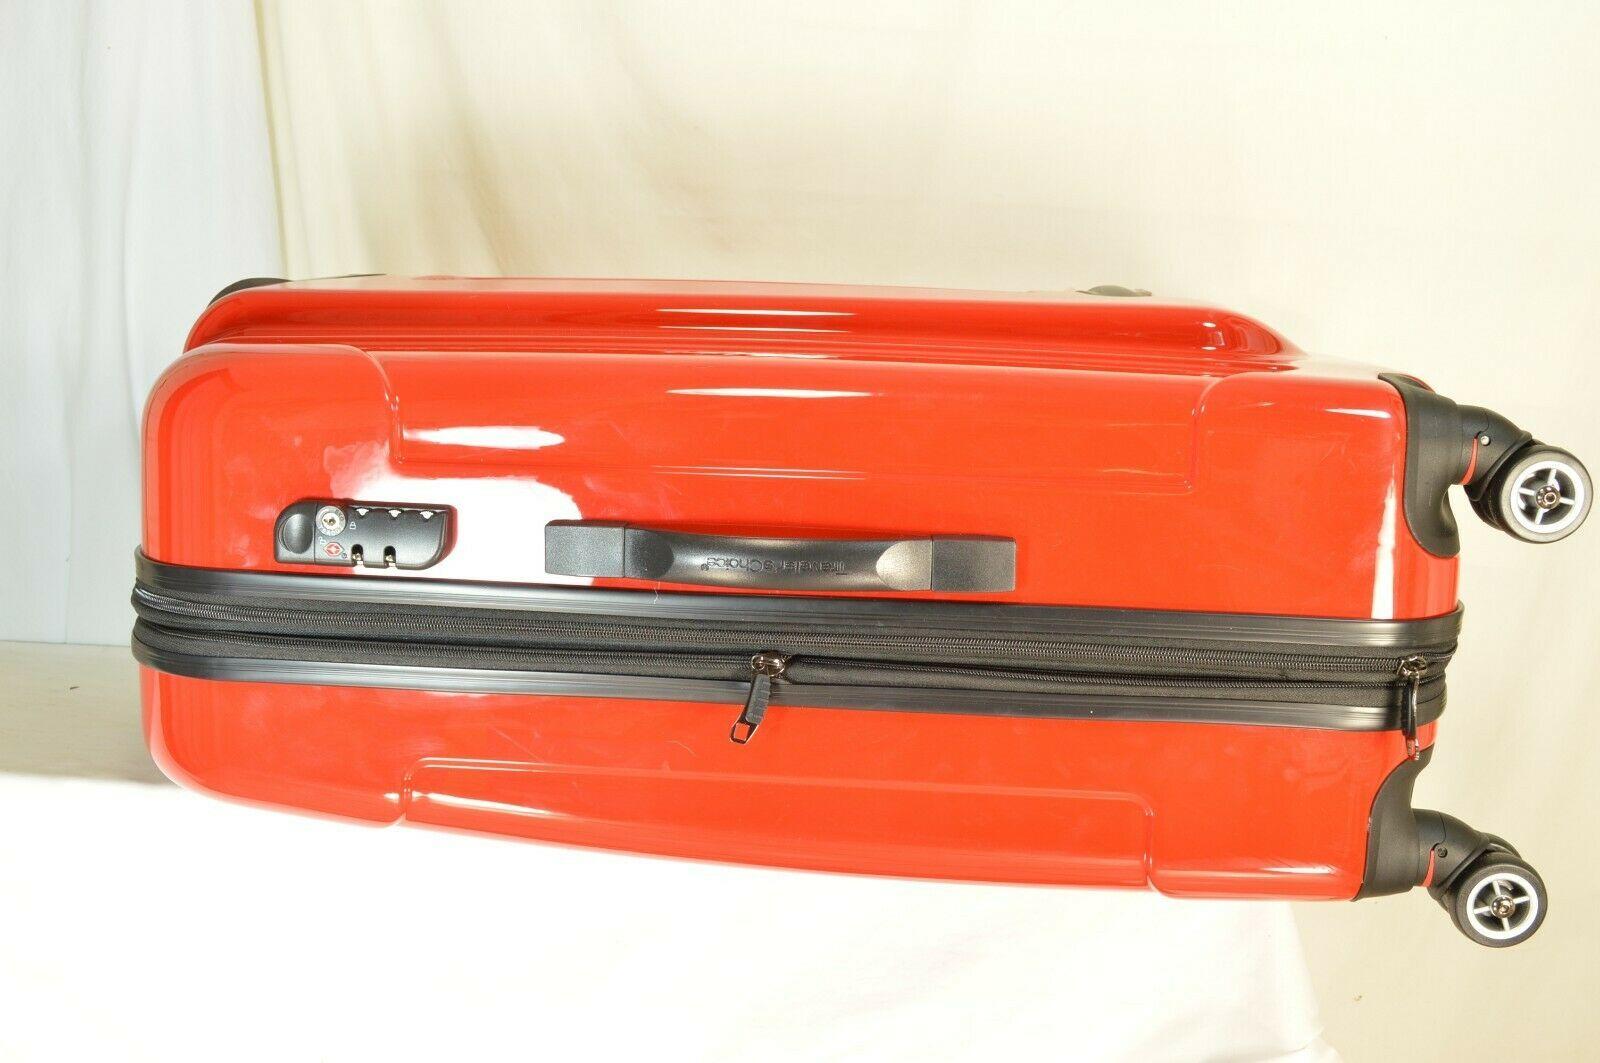 "Traveler's Choice 29"" Sedona new spinner red polycarbonate shell combo lock image 11"